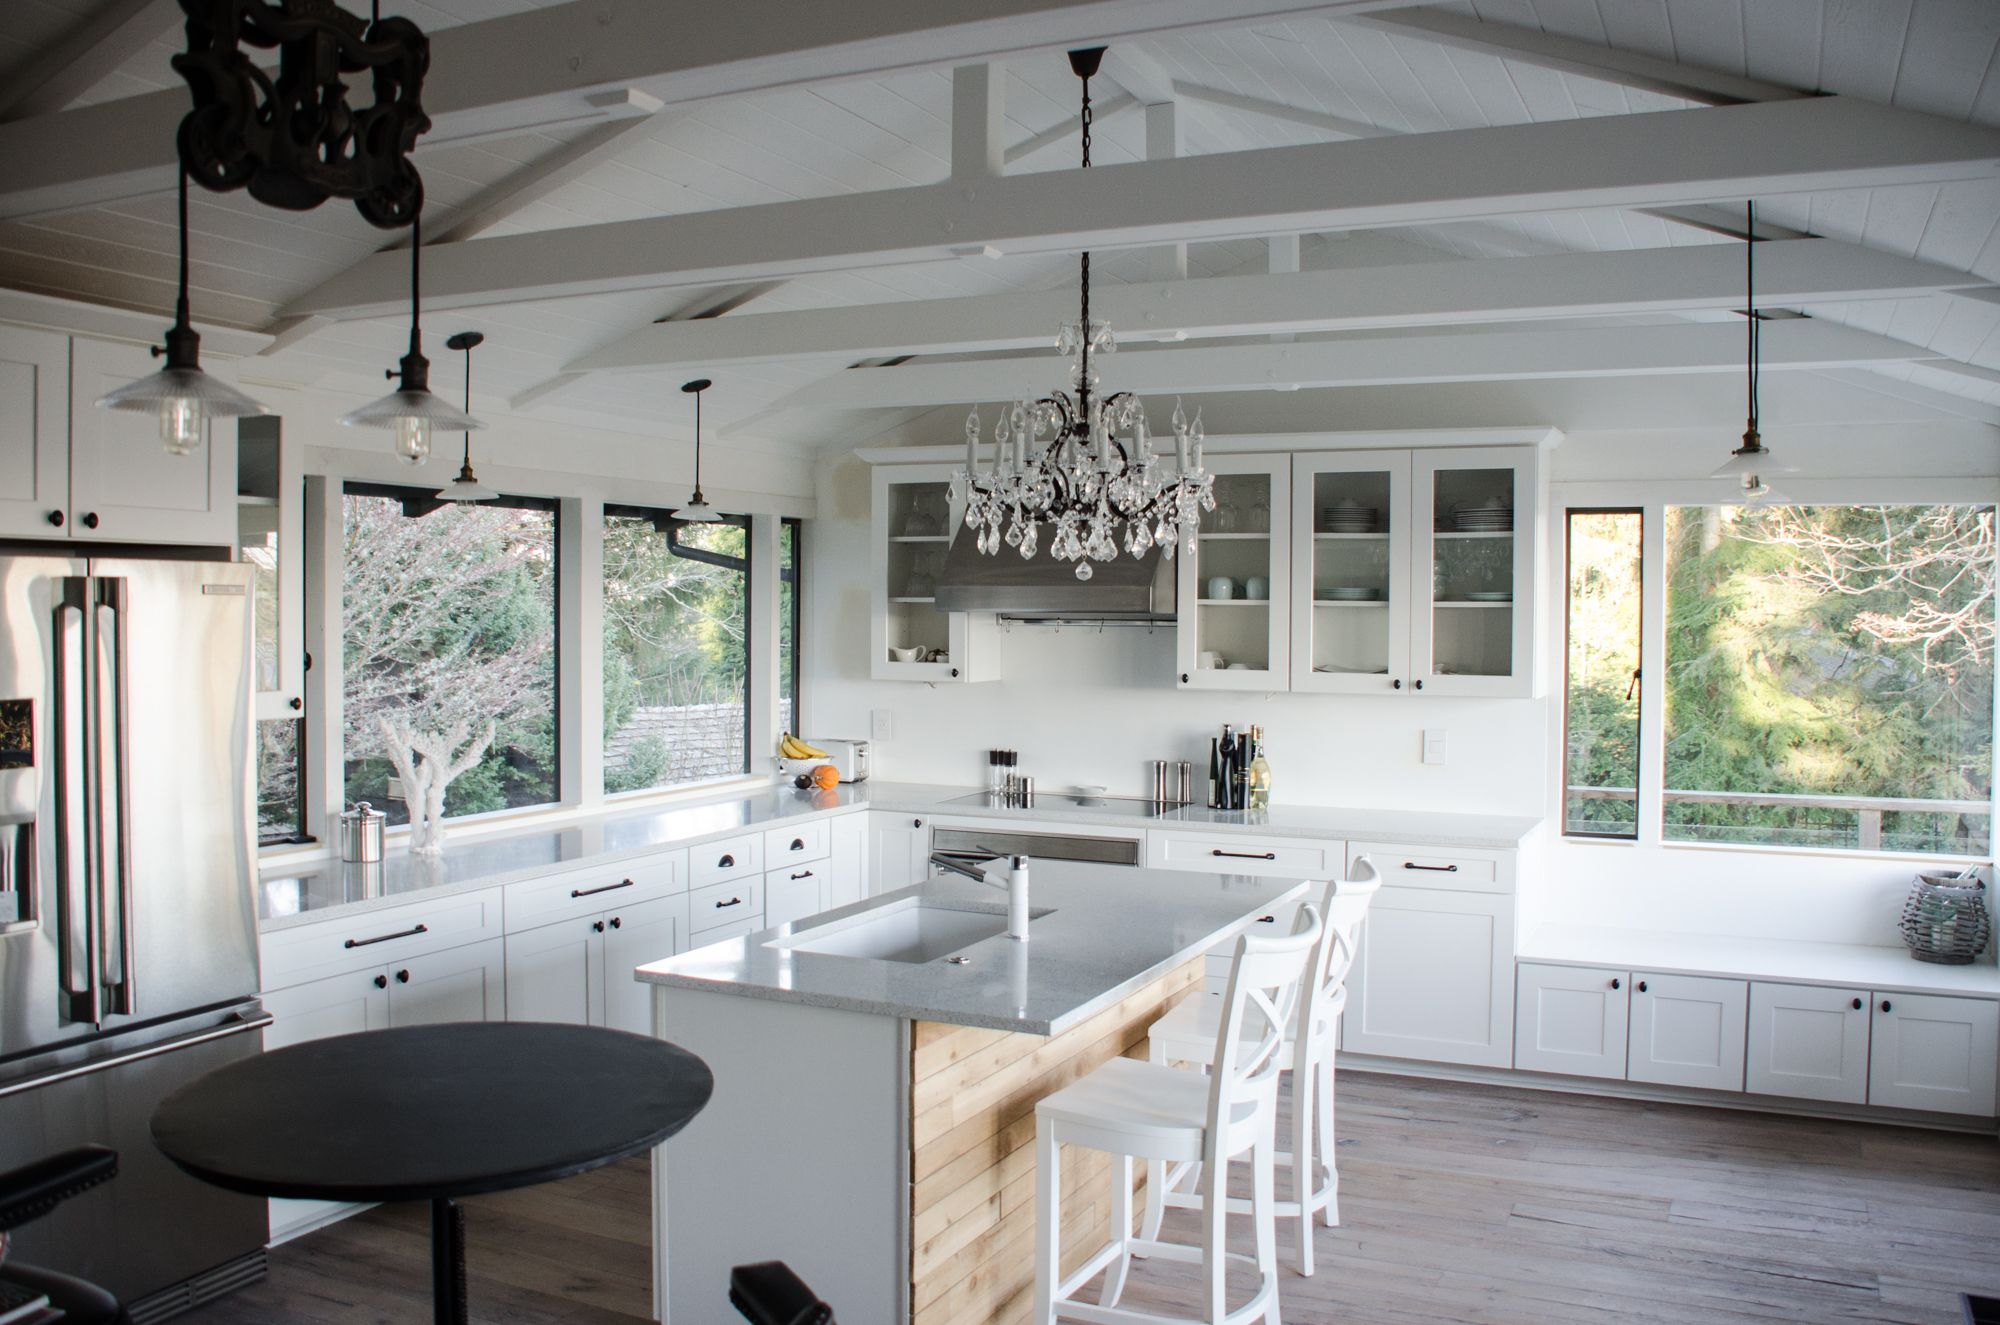 kitchen lighting vaulted ceiling. Kitchen Lighting Vaulted Ceiling N